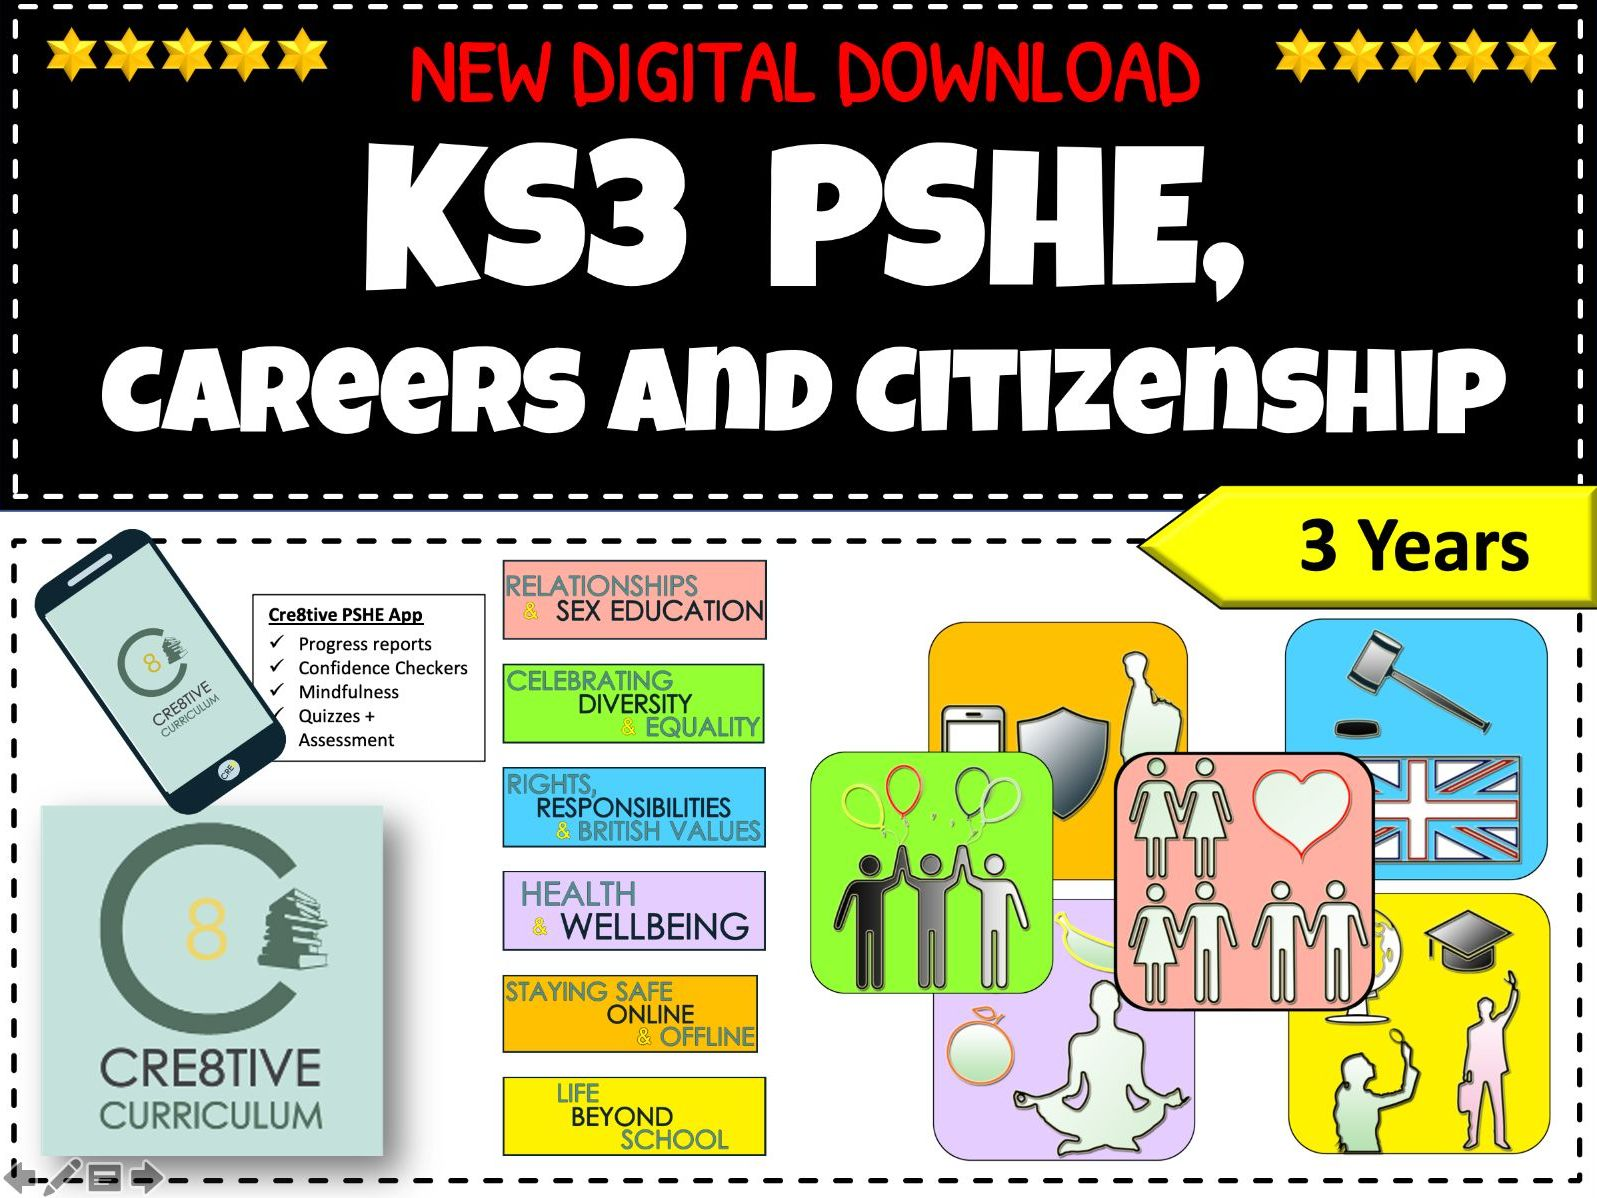 KS3 PSHE Curriculum